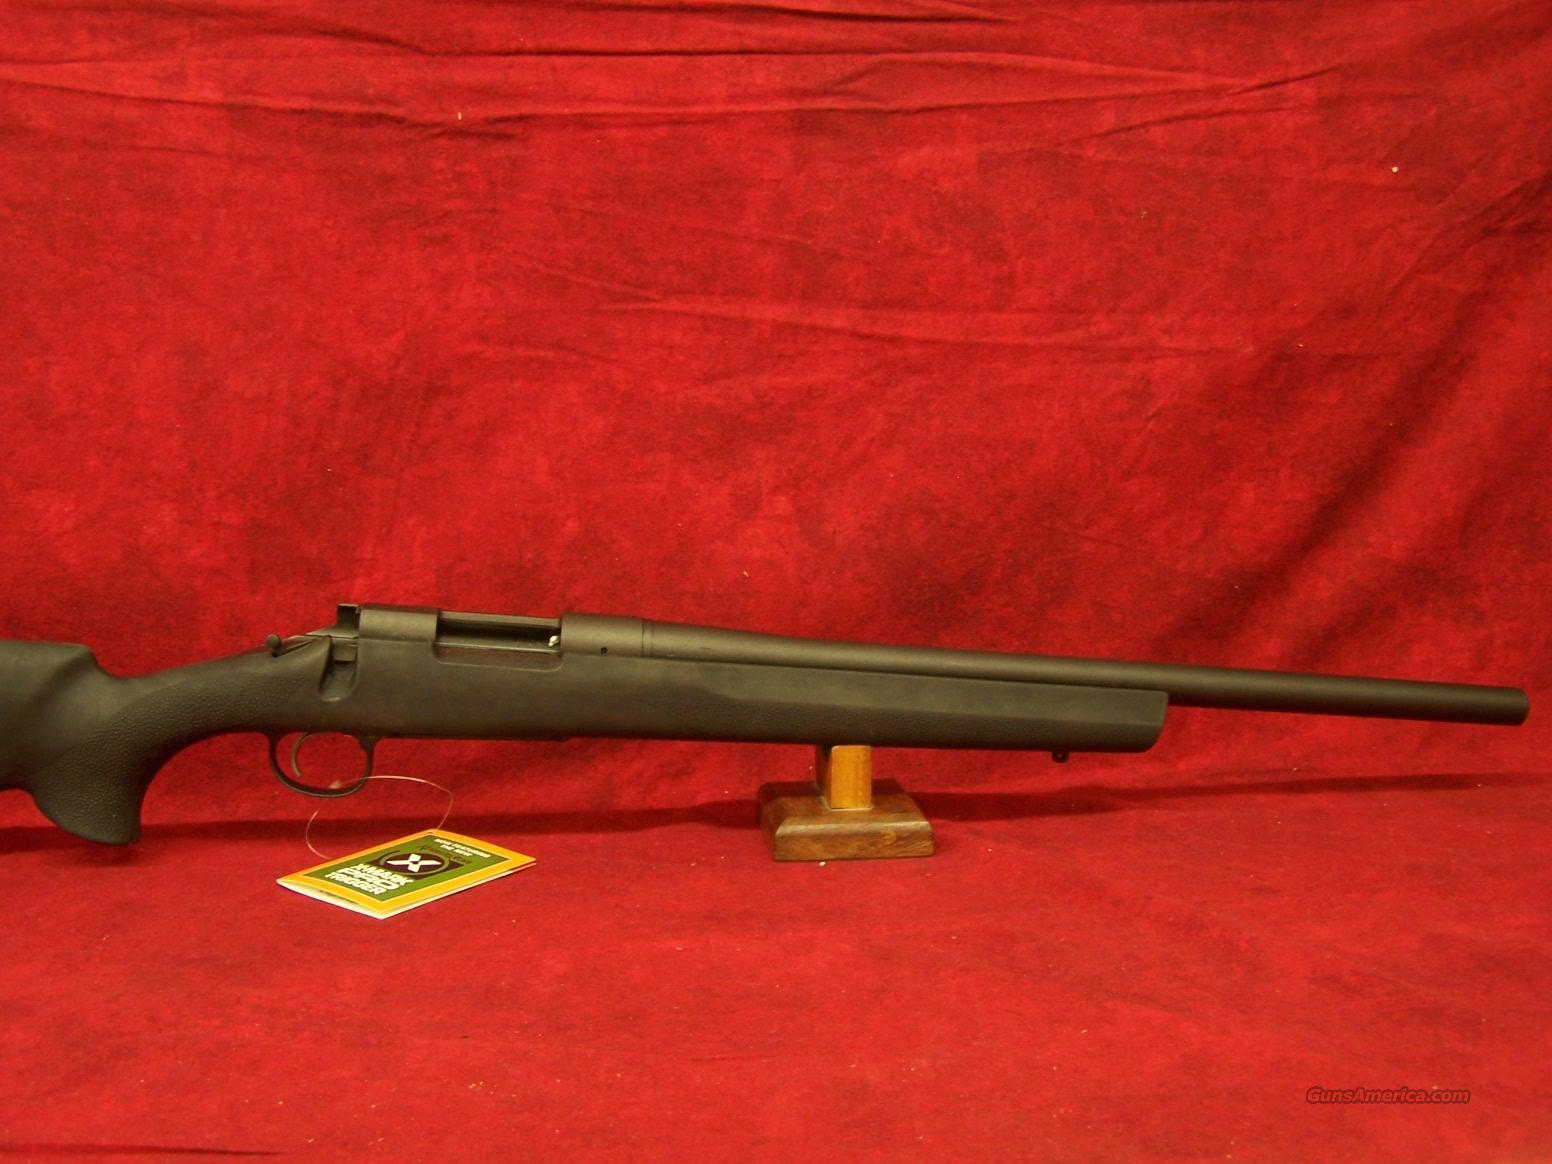 Remington 700 SPS Tactical .308 Win (84207)  Guns > Rifles > Remington Rifles - Modern > Model 700 > Tactical